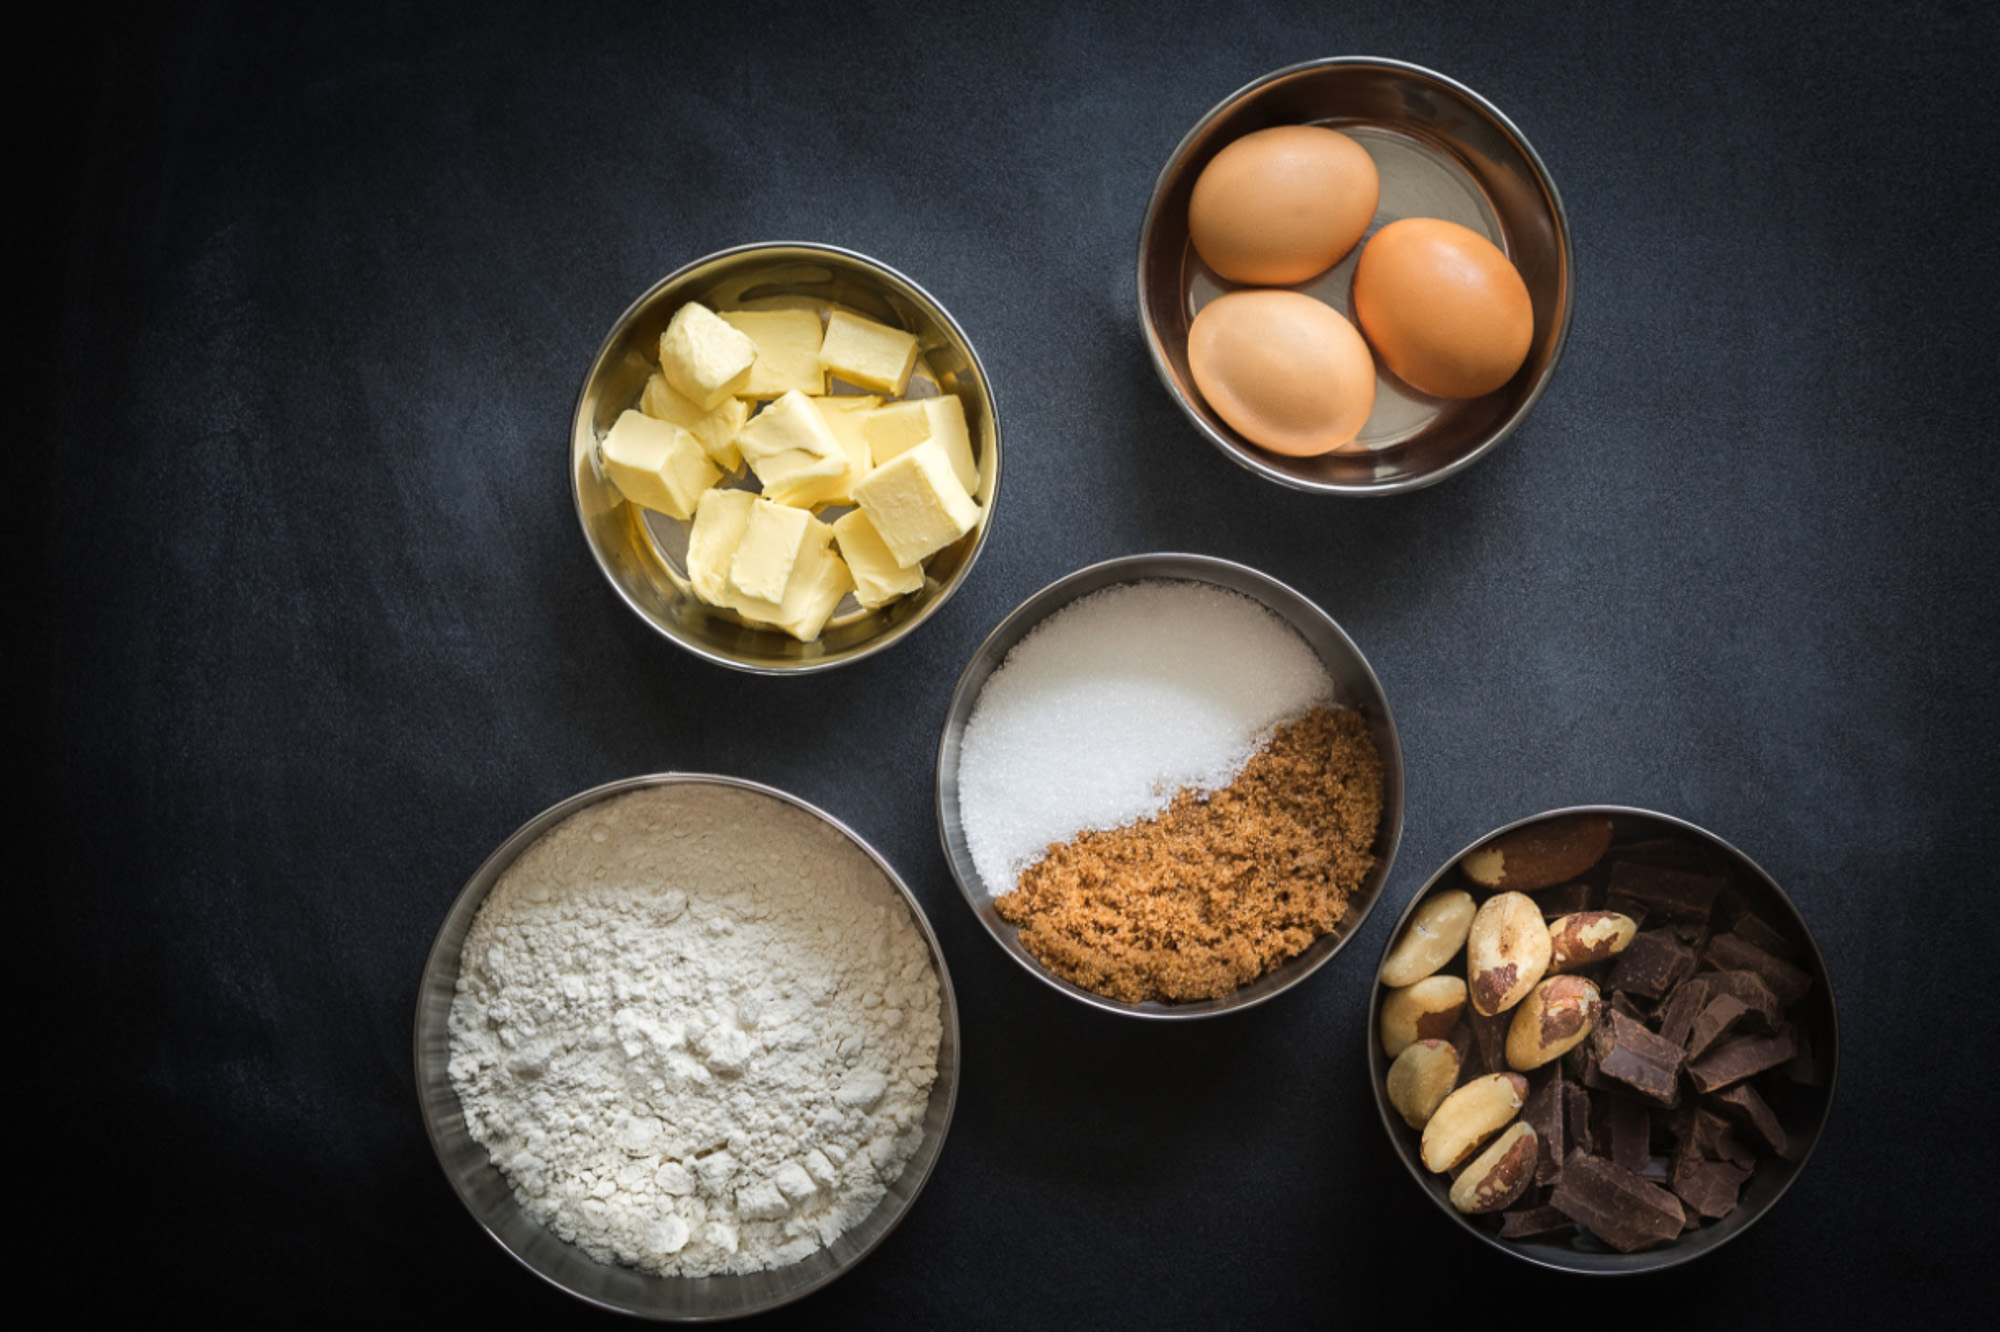 saigoncookieingredients.jpg